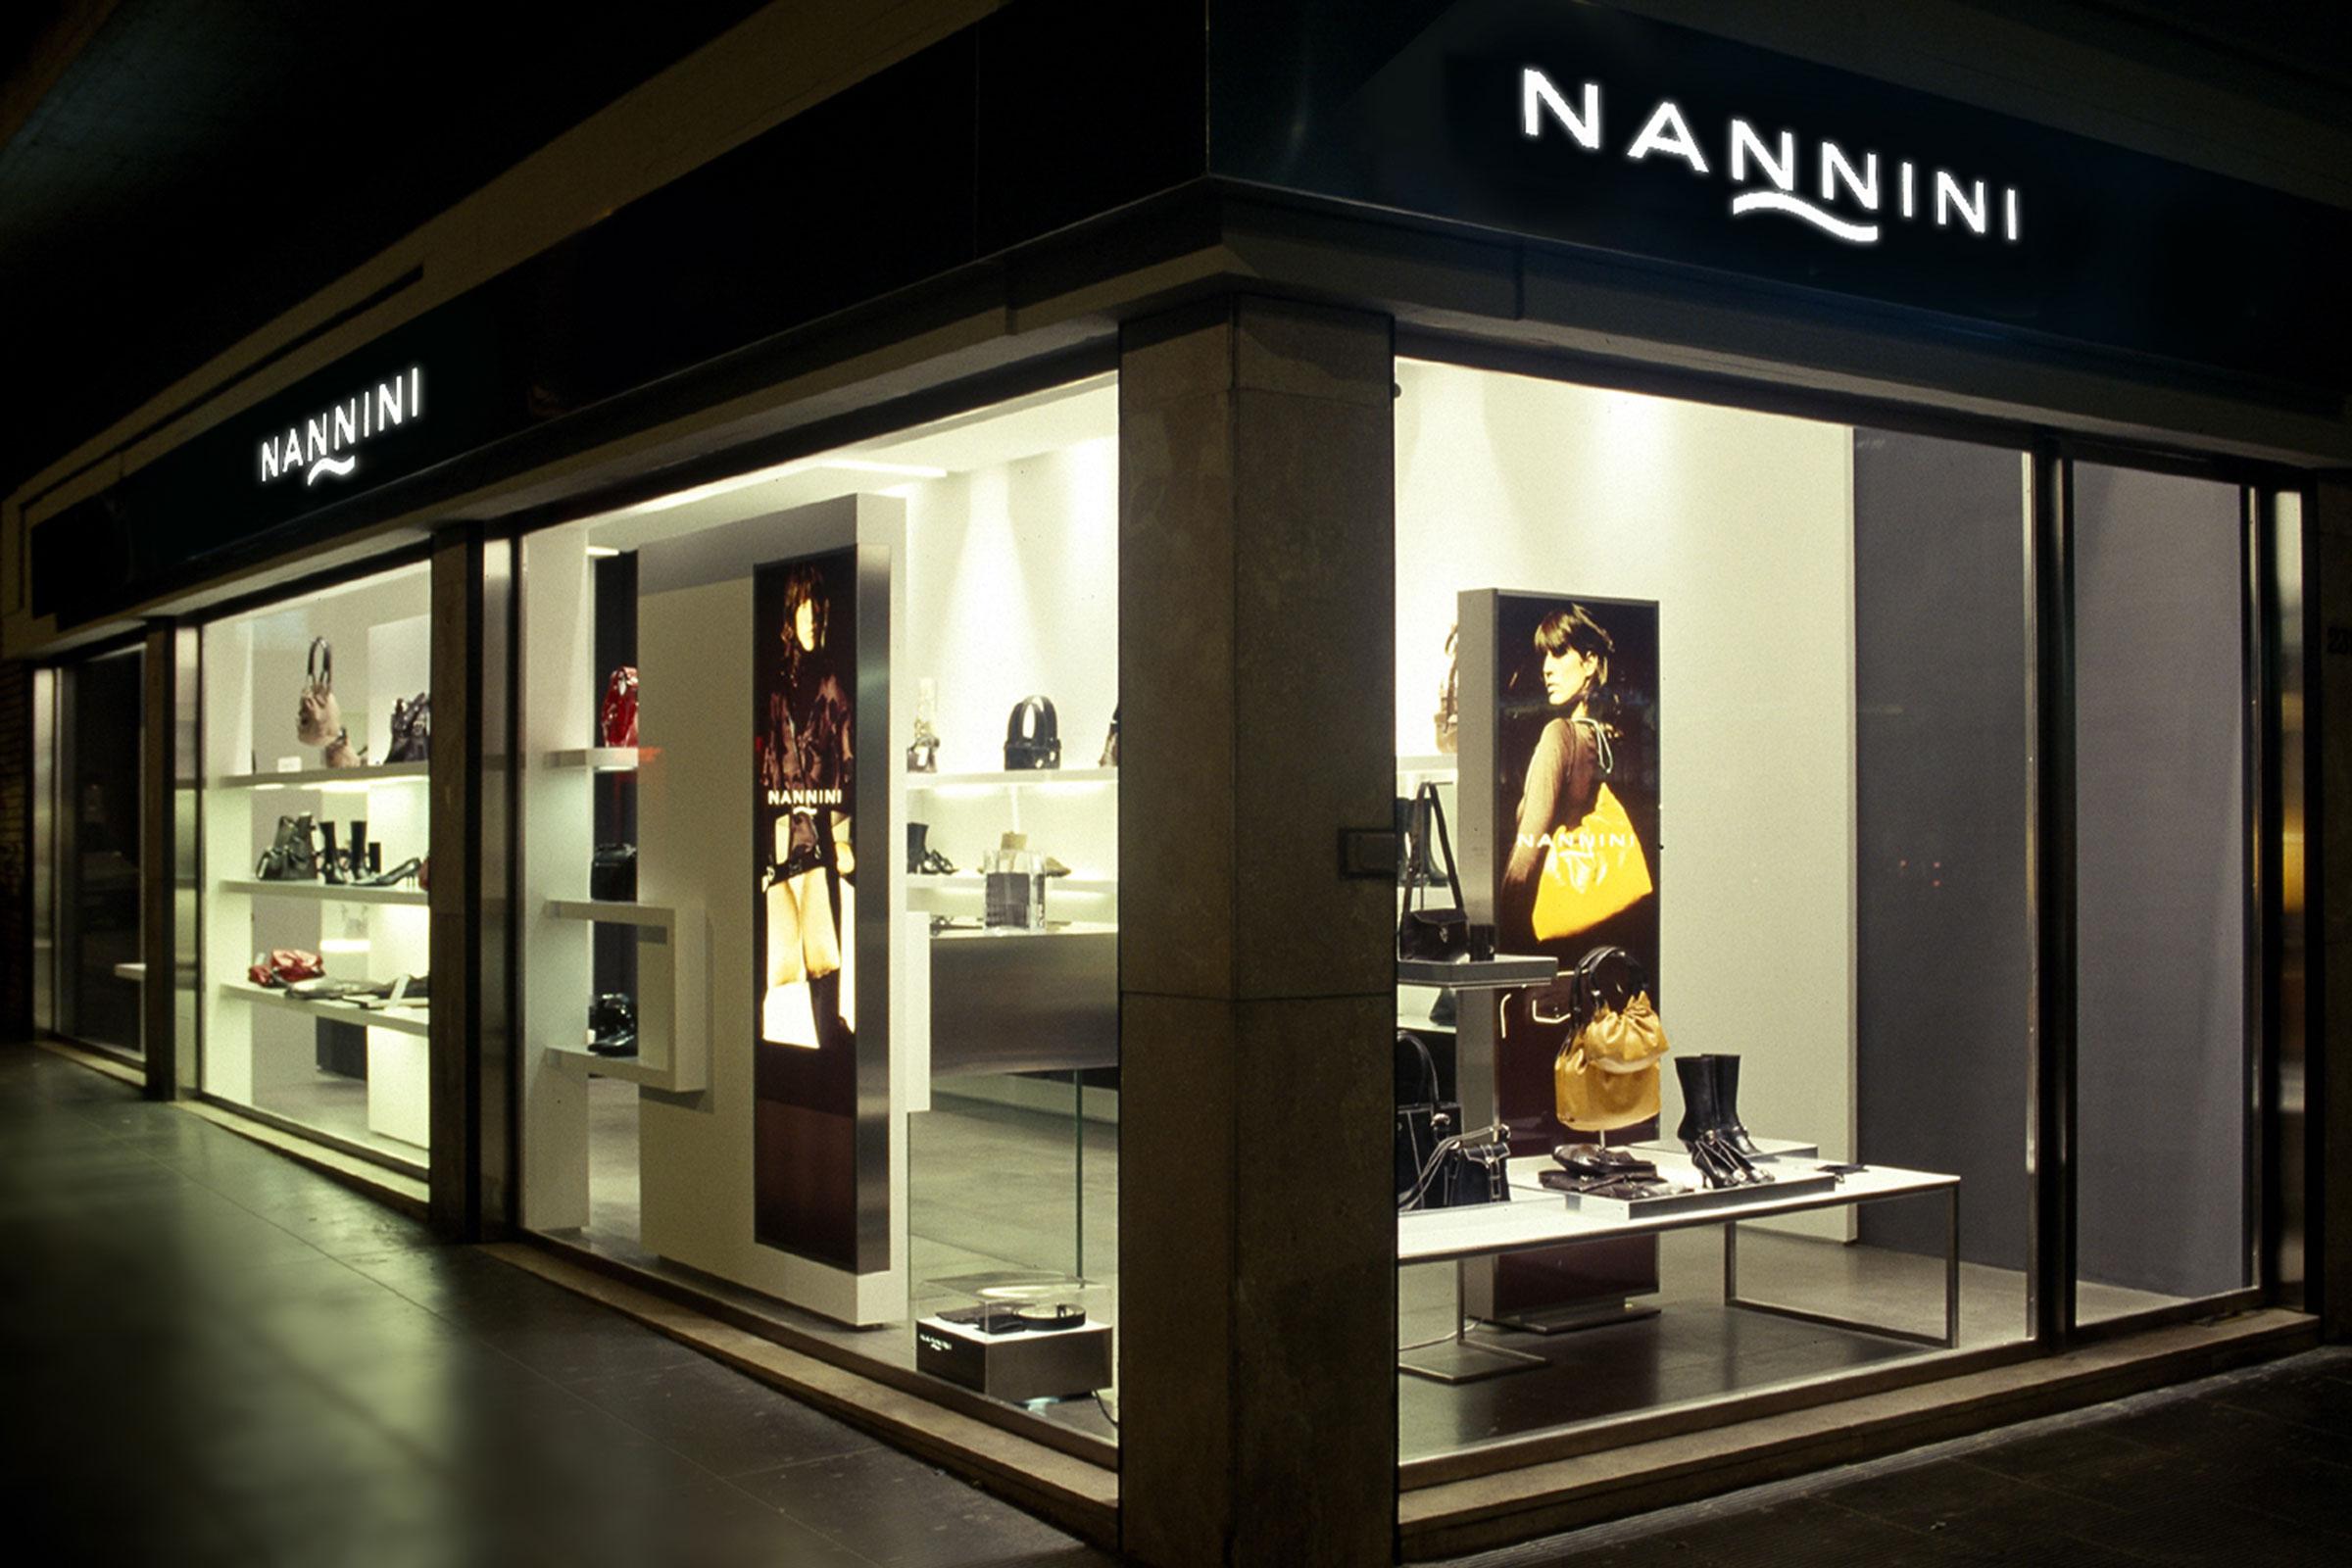 05_nannini_worldwide_2400x1600